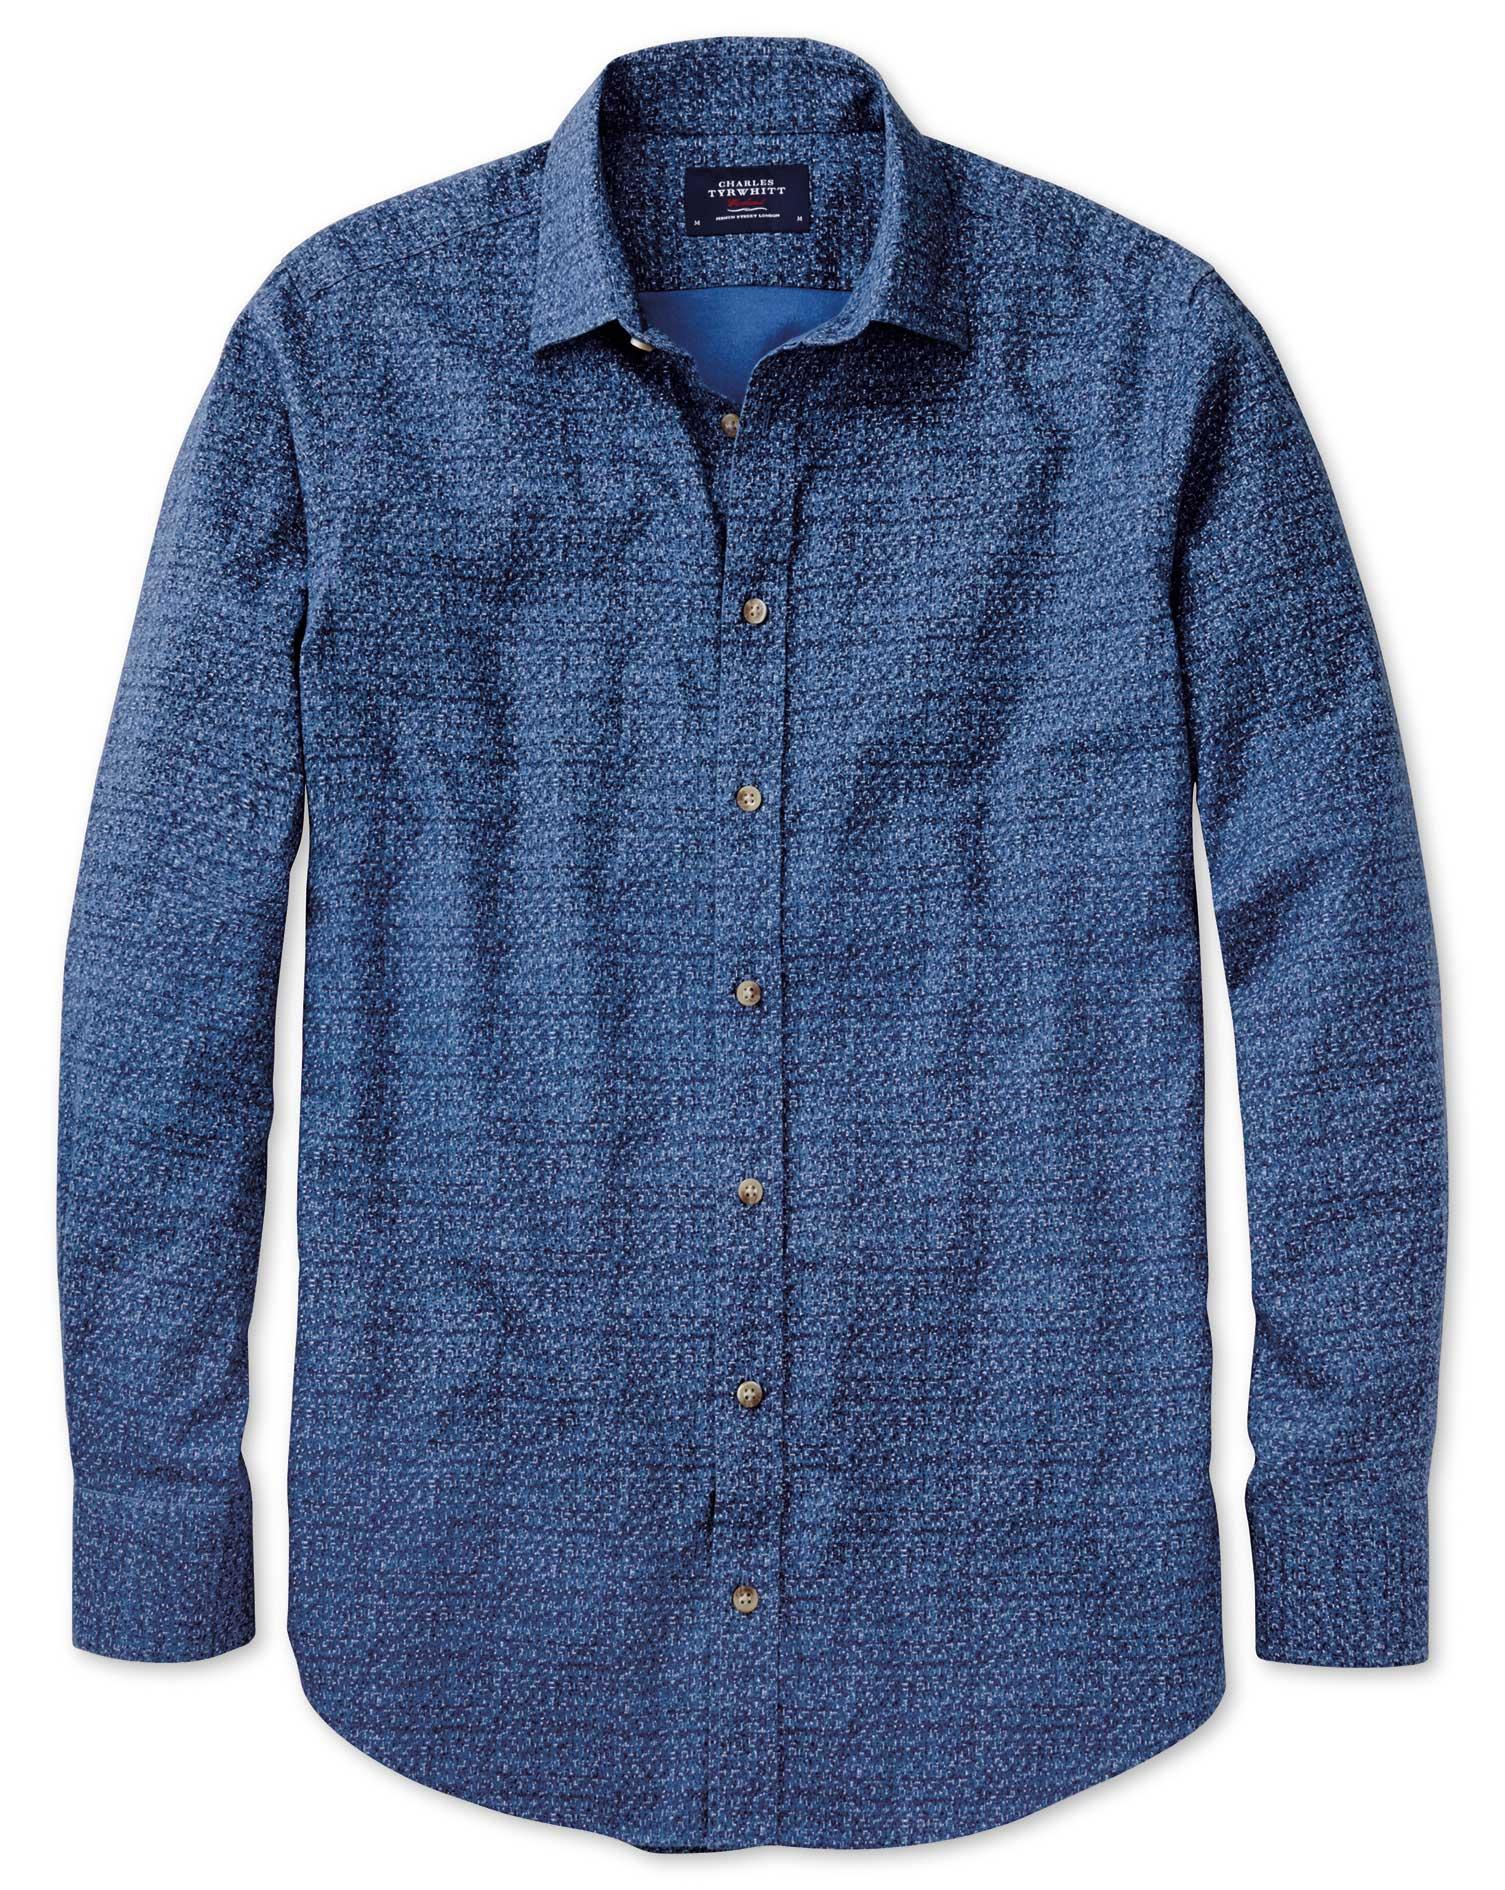 Classic Fit Blue Print Shirt Single Cuff Size Large by Charles Tyrwhitt